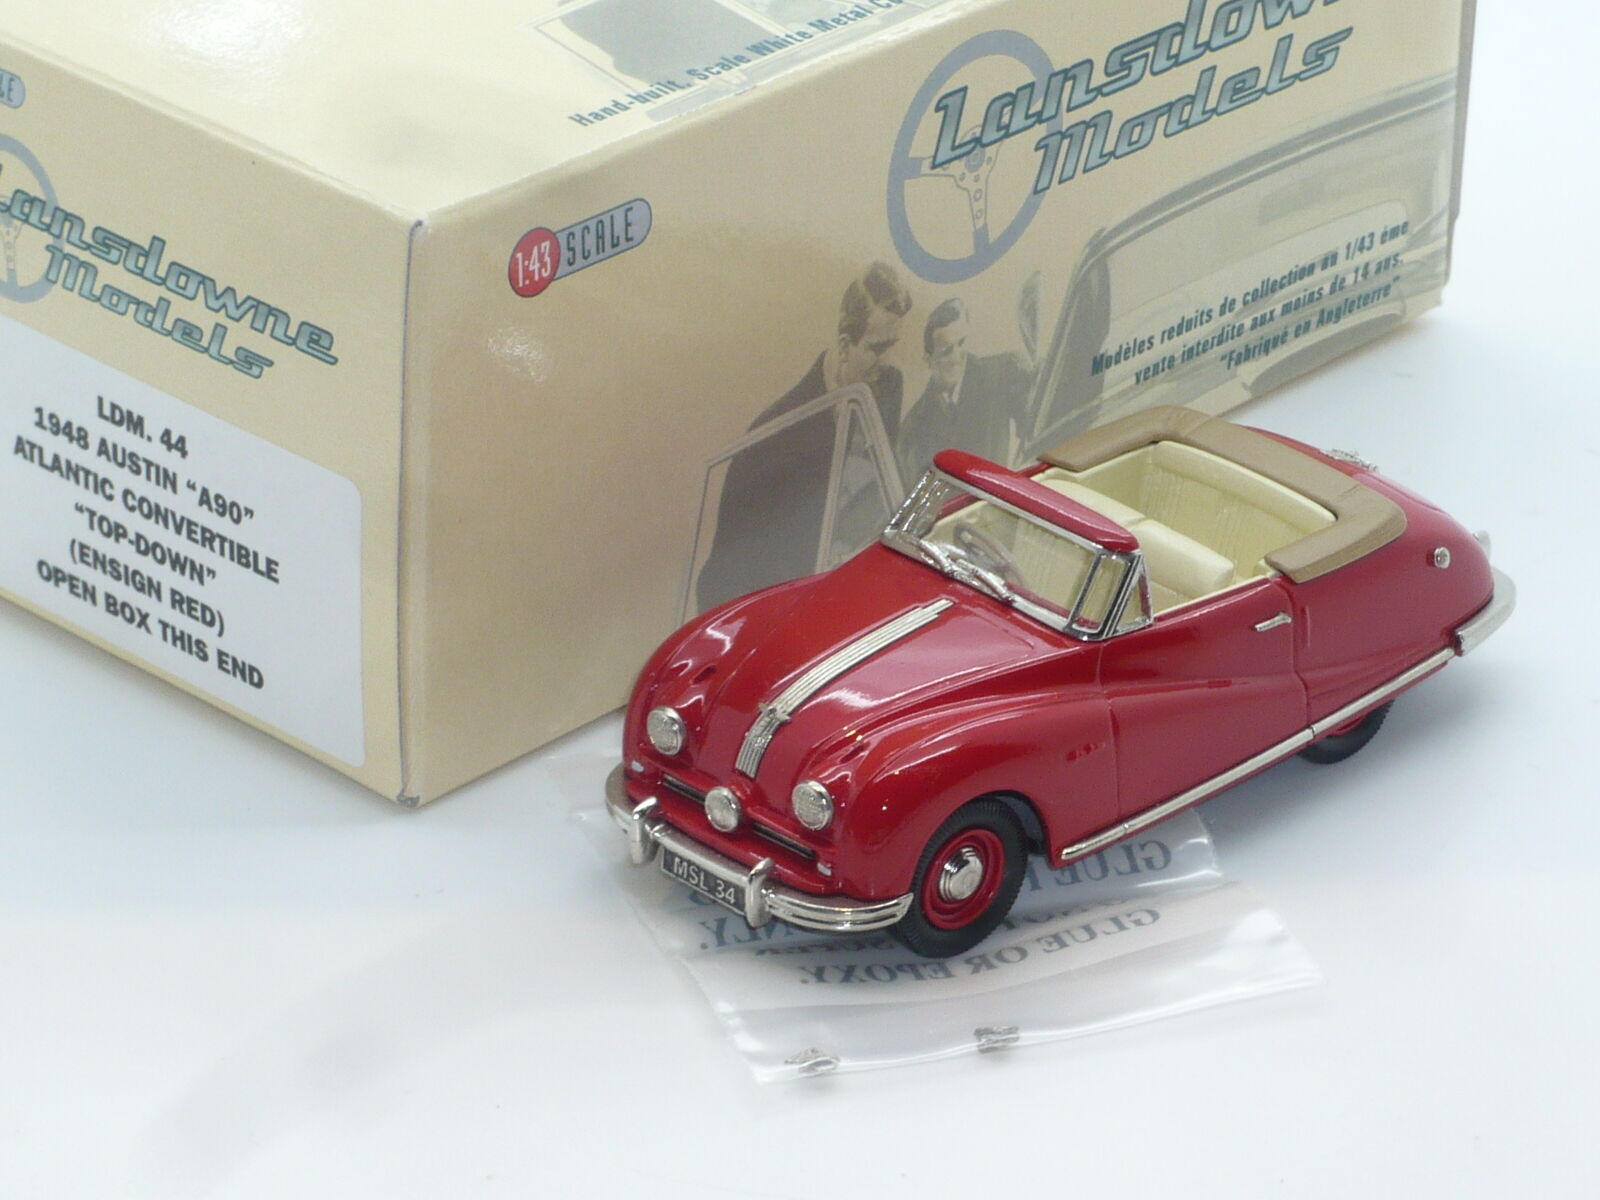 New 1 43 Lansdowne Models LDM44 1948 Austin A90 Atlantic Handbuilt Brooklin